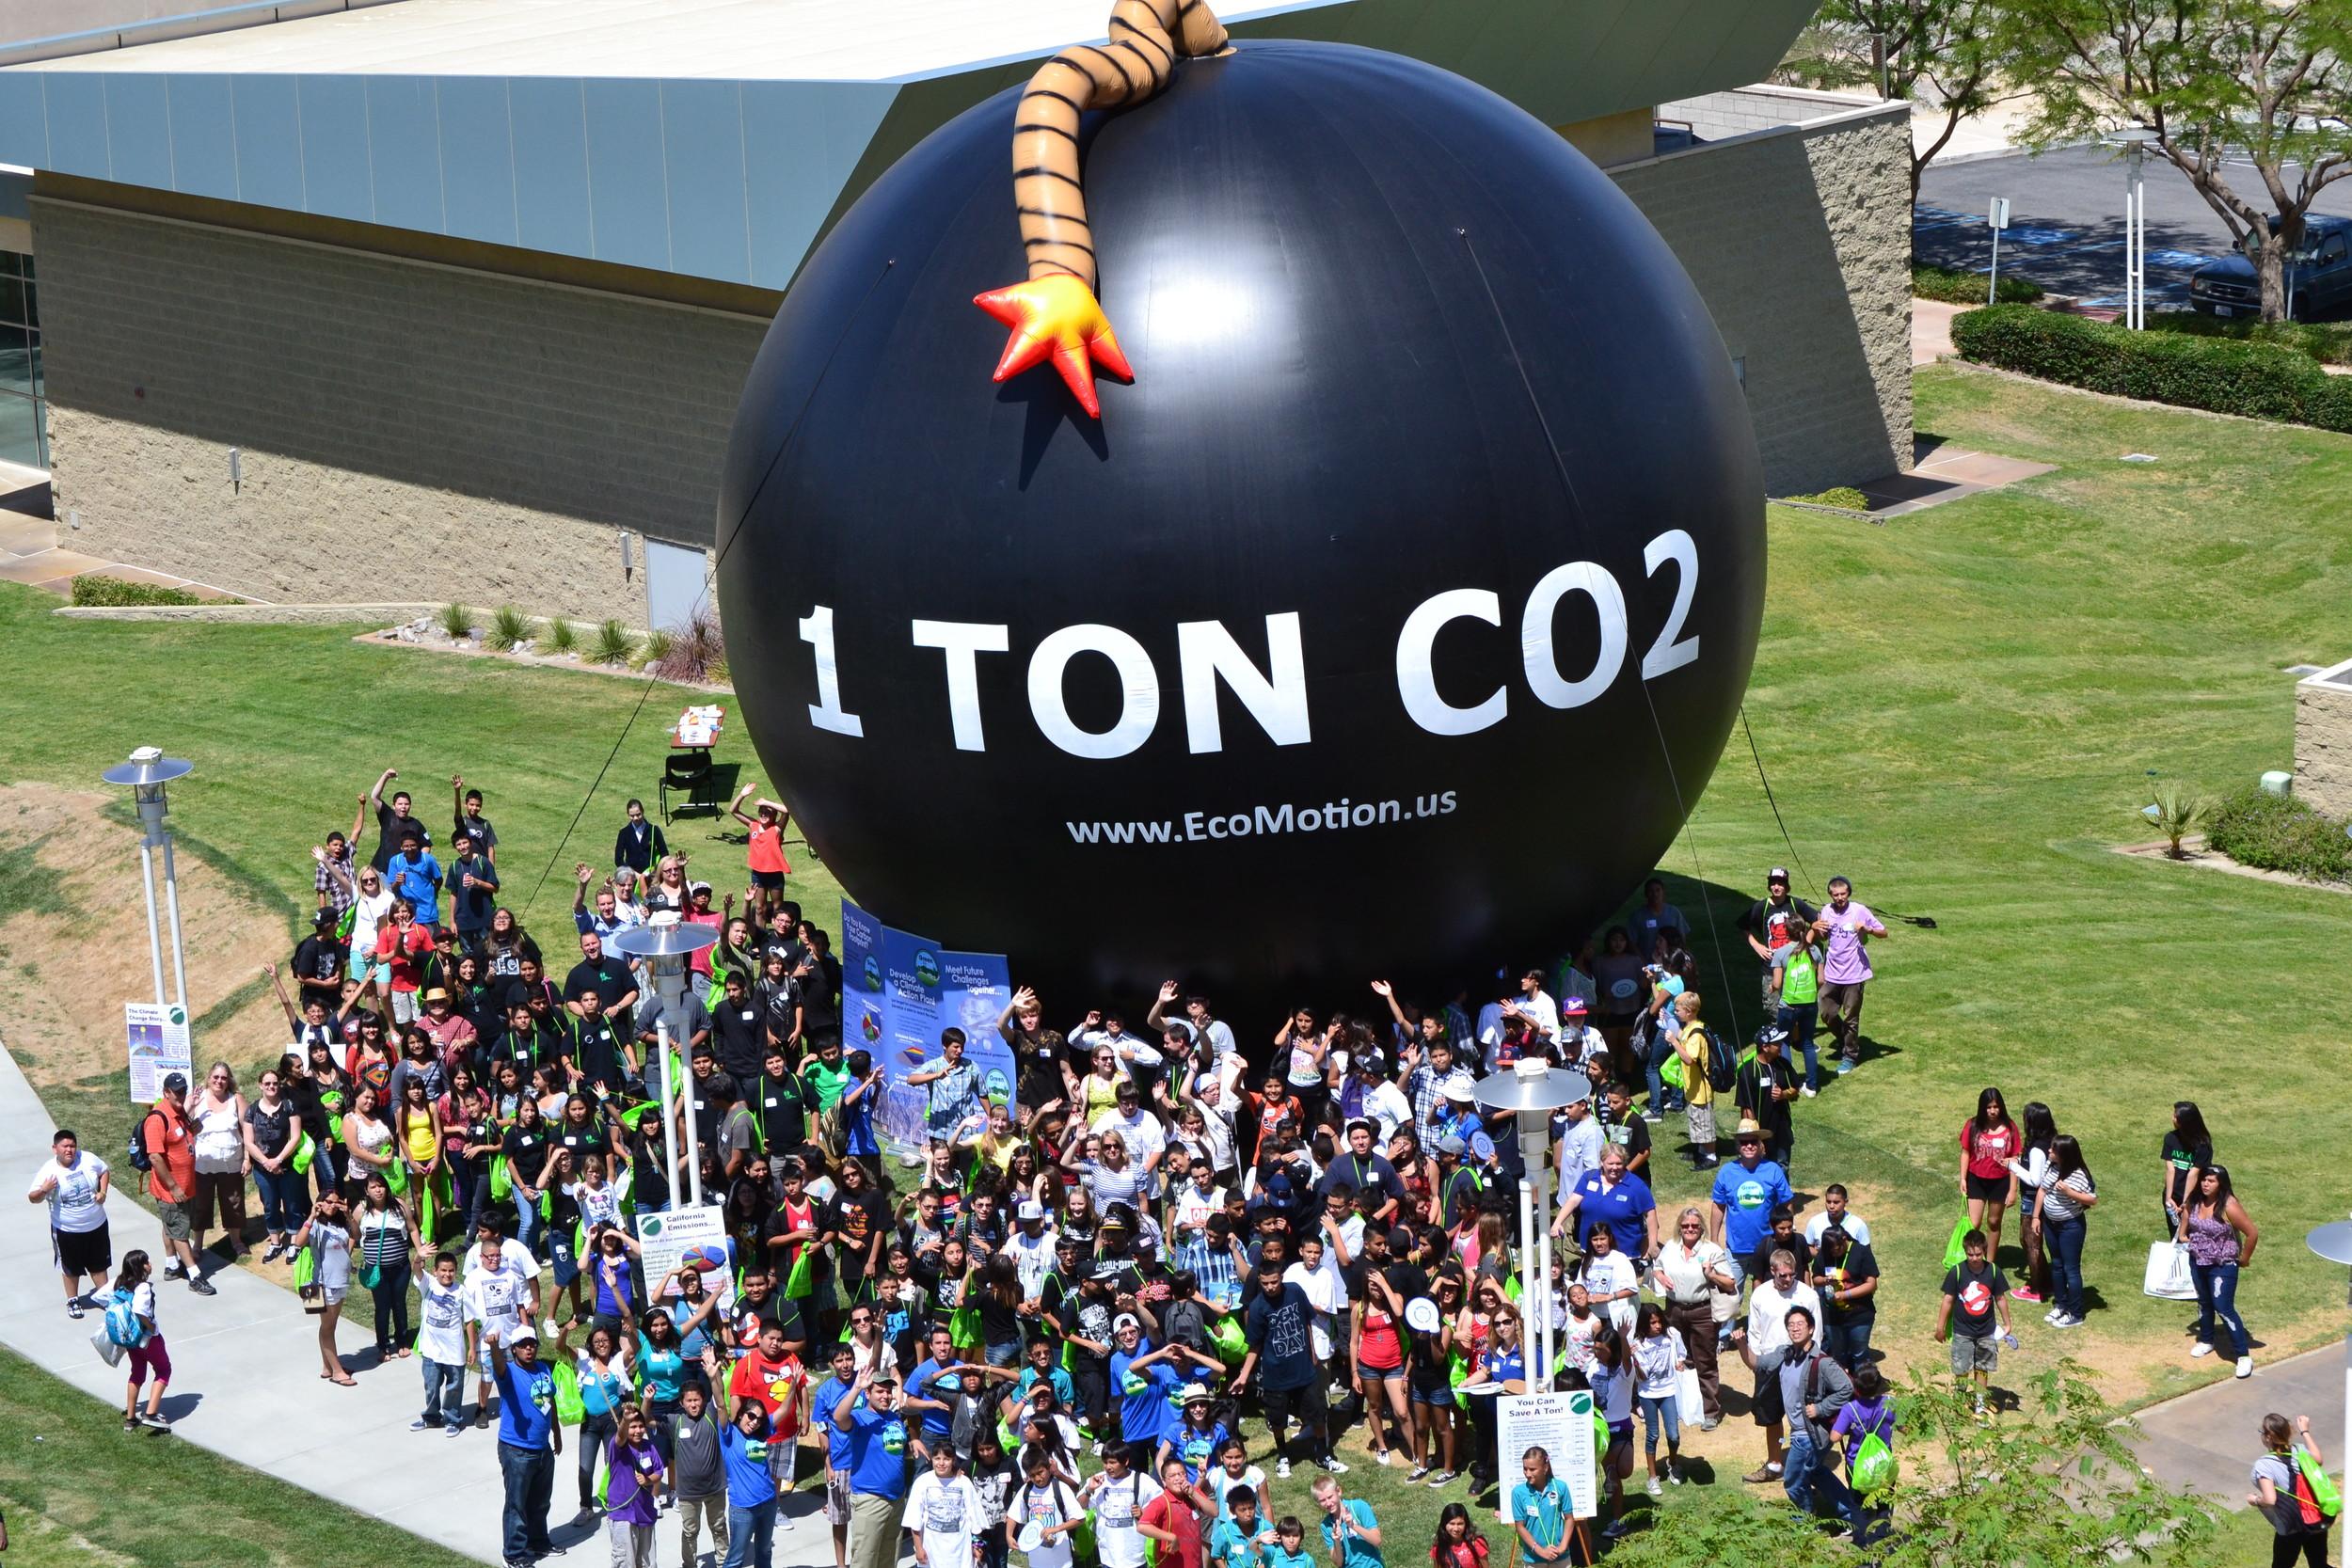 THE Ton at an environmental expo in Palm Desert, California